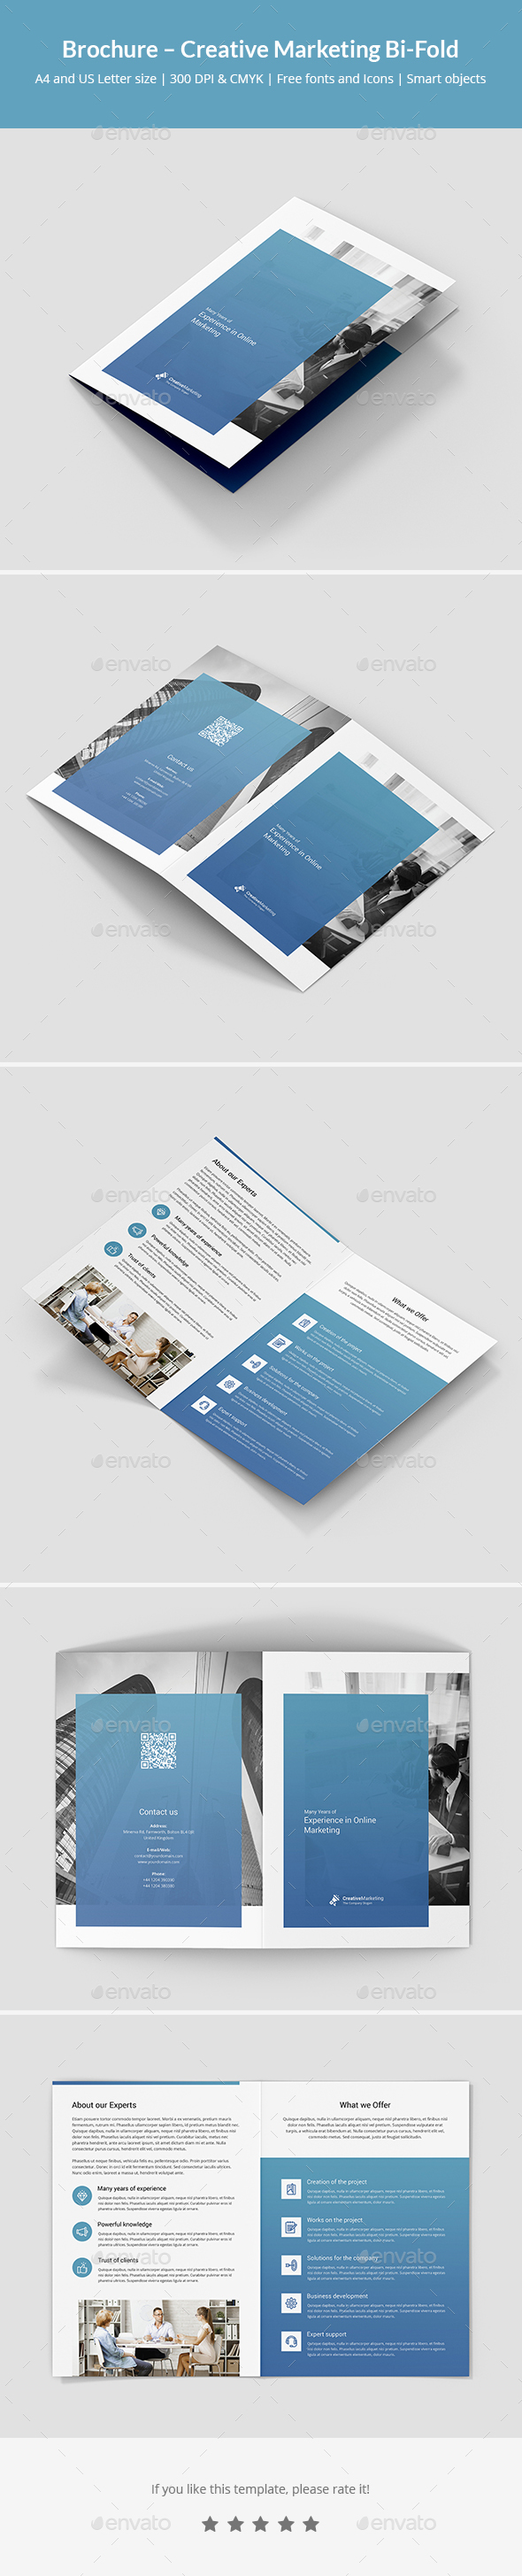 Brochure – Creative Marketing Bi-Fold - Corporate Brochures